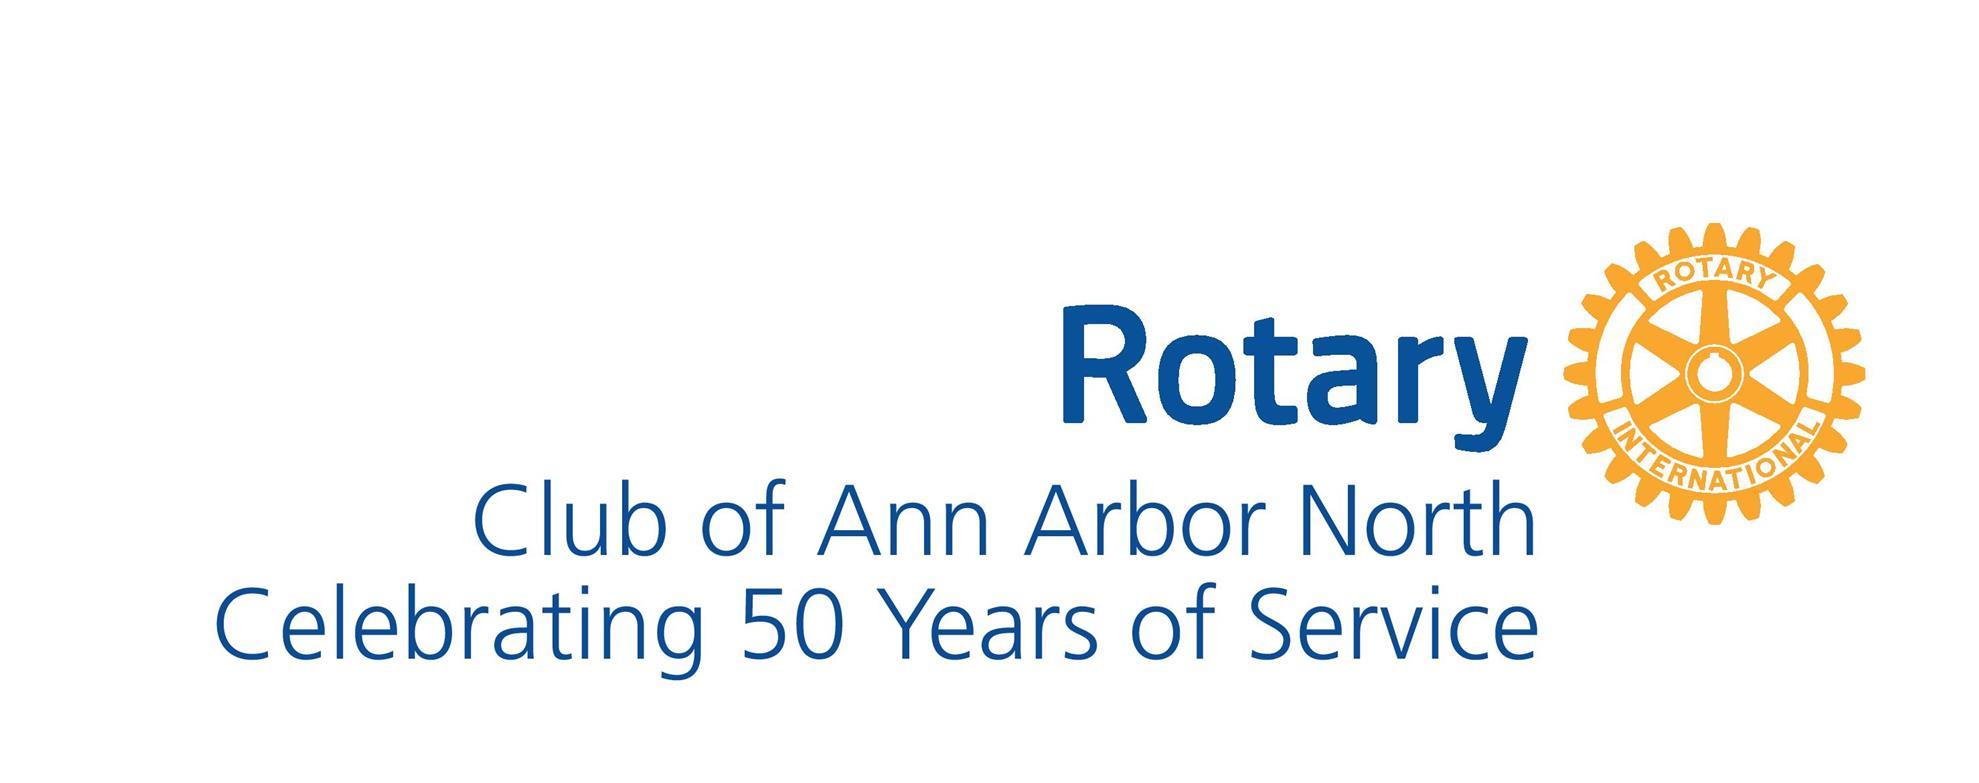 Rotary Club of Ann Arbor North